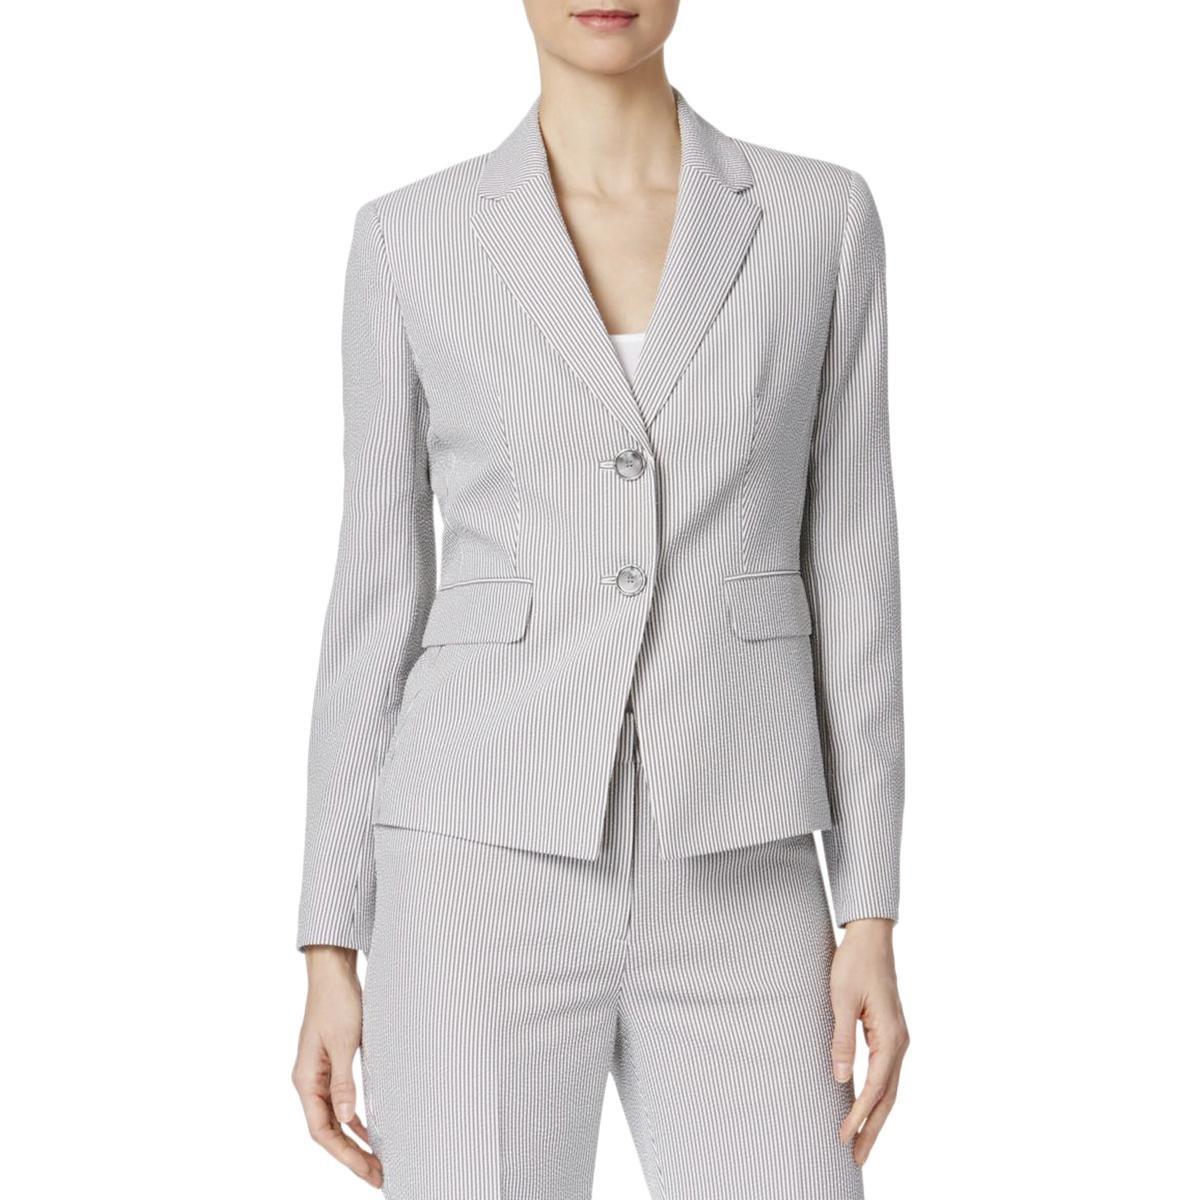 Kasper Women's Petite Size 2 Button Notch Collar Pinstripe Seersucker Jacket, White/Black, 2P